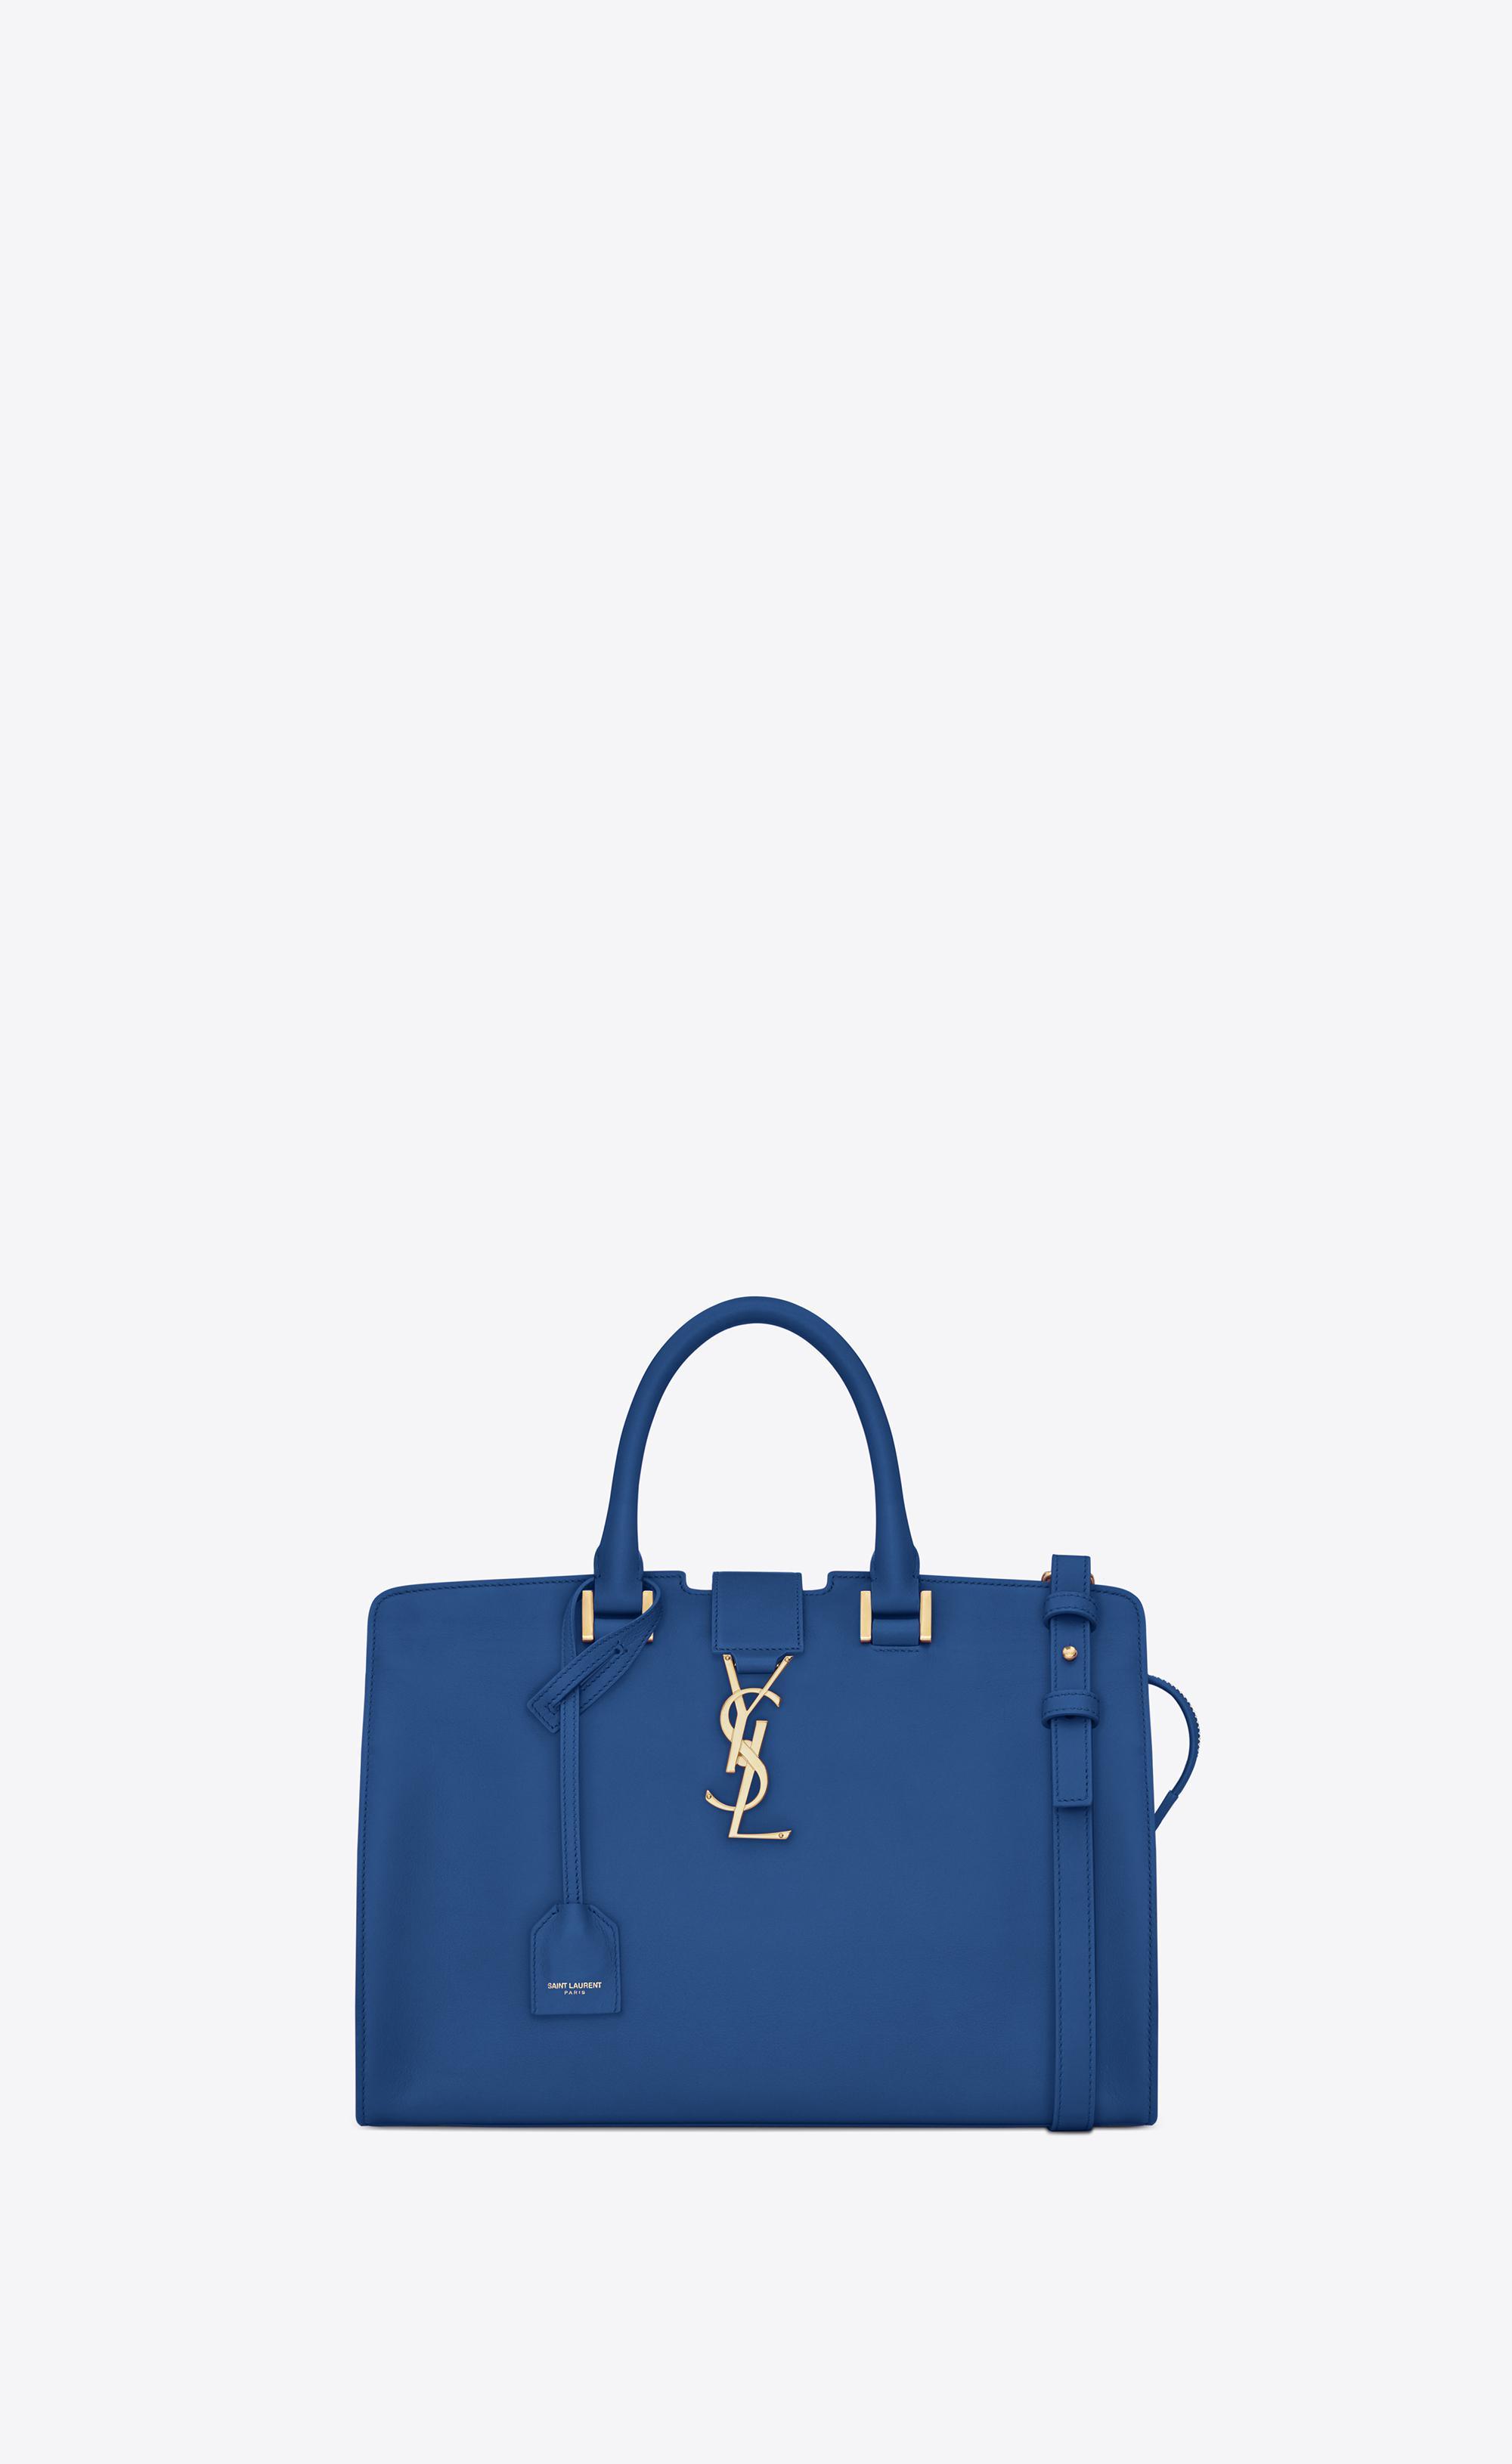 f7c6da95e45 Saint Laurent Small Monogram Cabas Bag In Royal Blue Leather in Blue ...